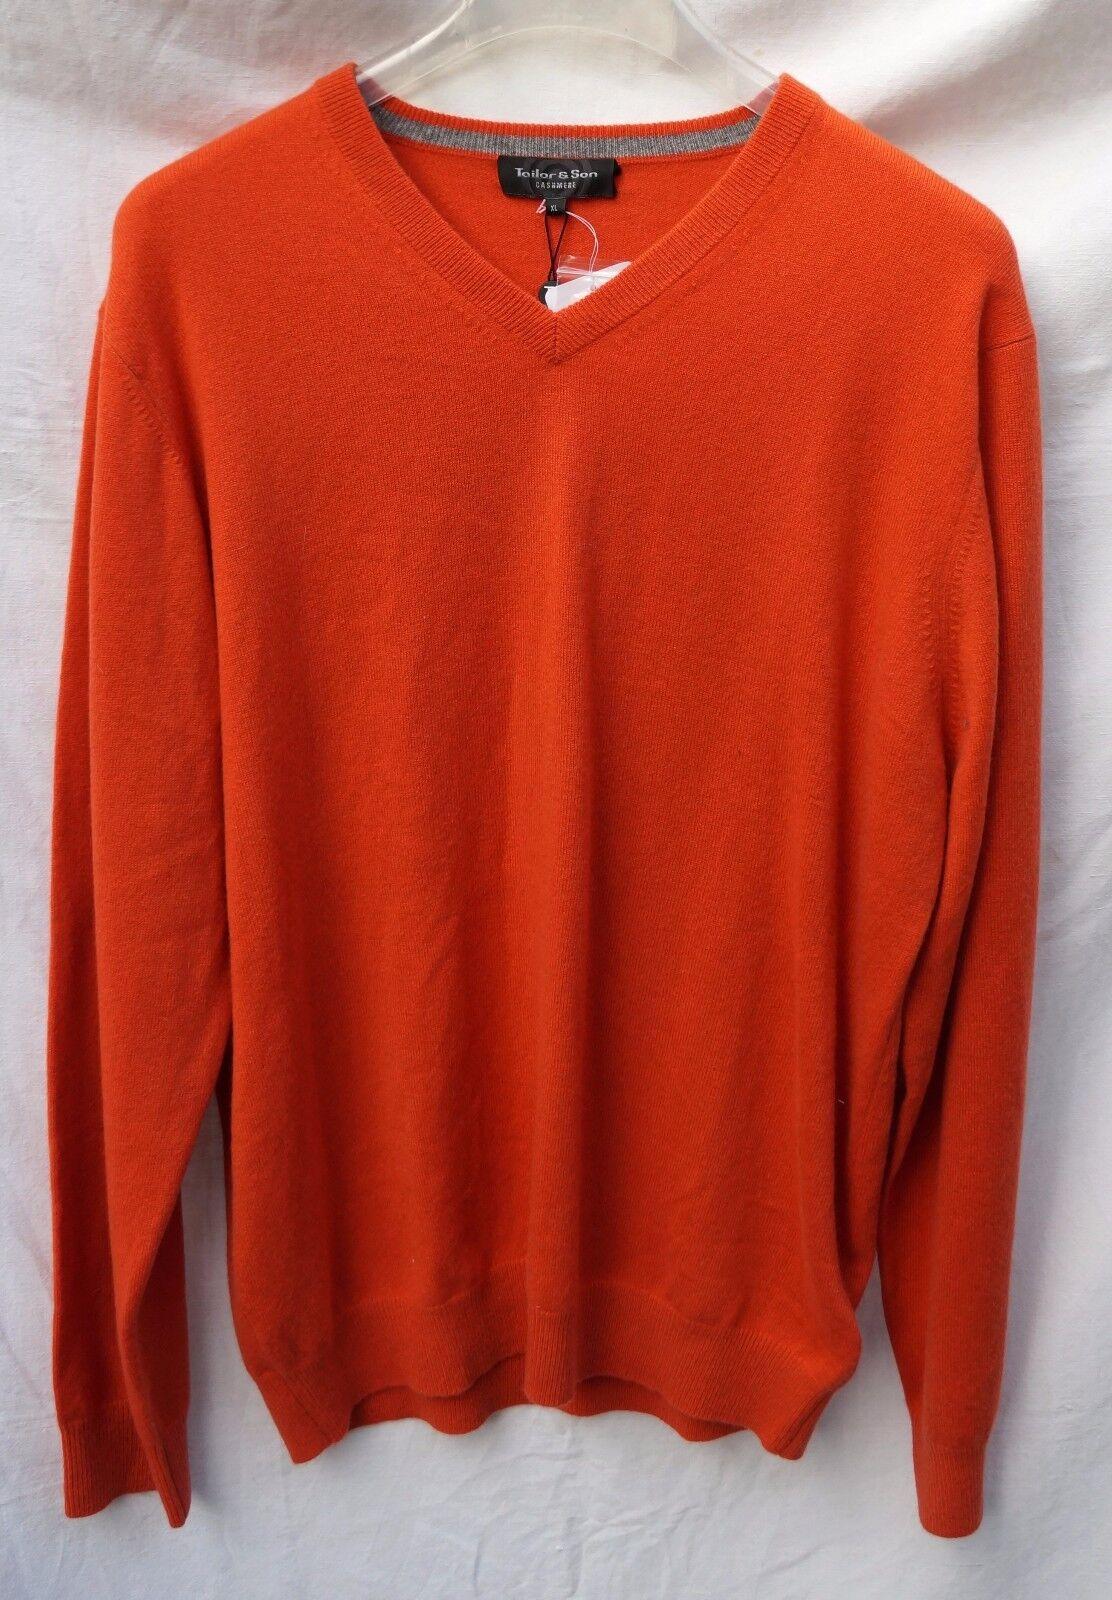 100% Kaschmir Herren Pullover Orange Gr.XL TAILOR & SON rot V-Ausschnitt